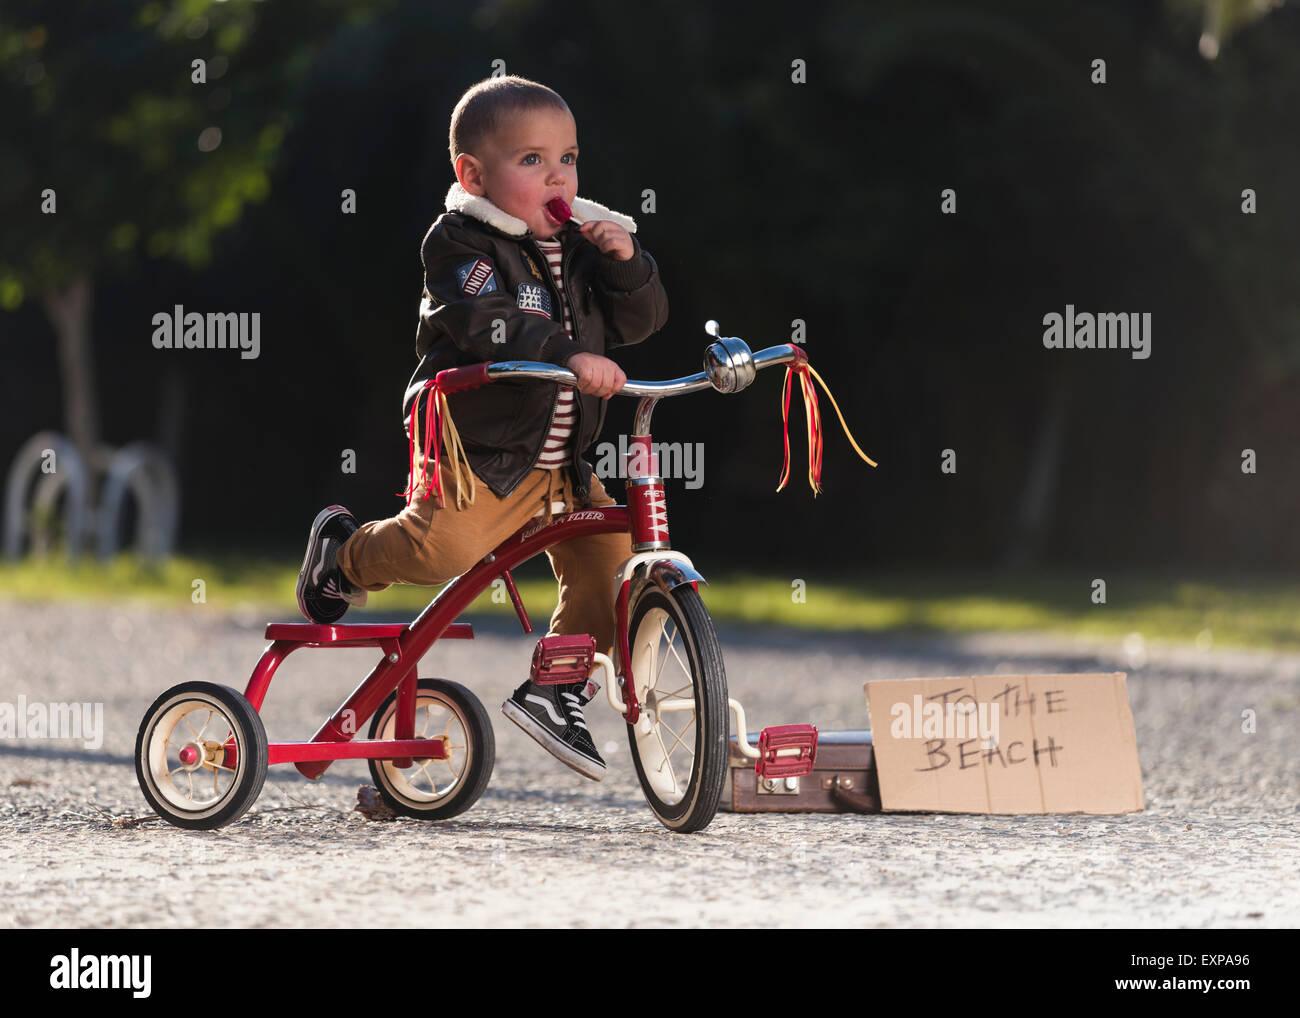 Junge auf seinem Fahrrad. Stockbild